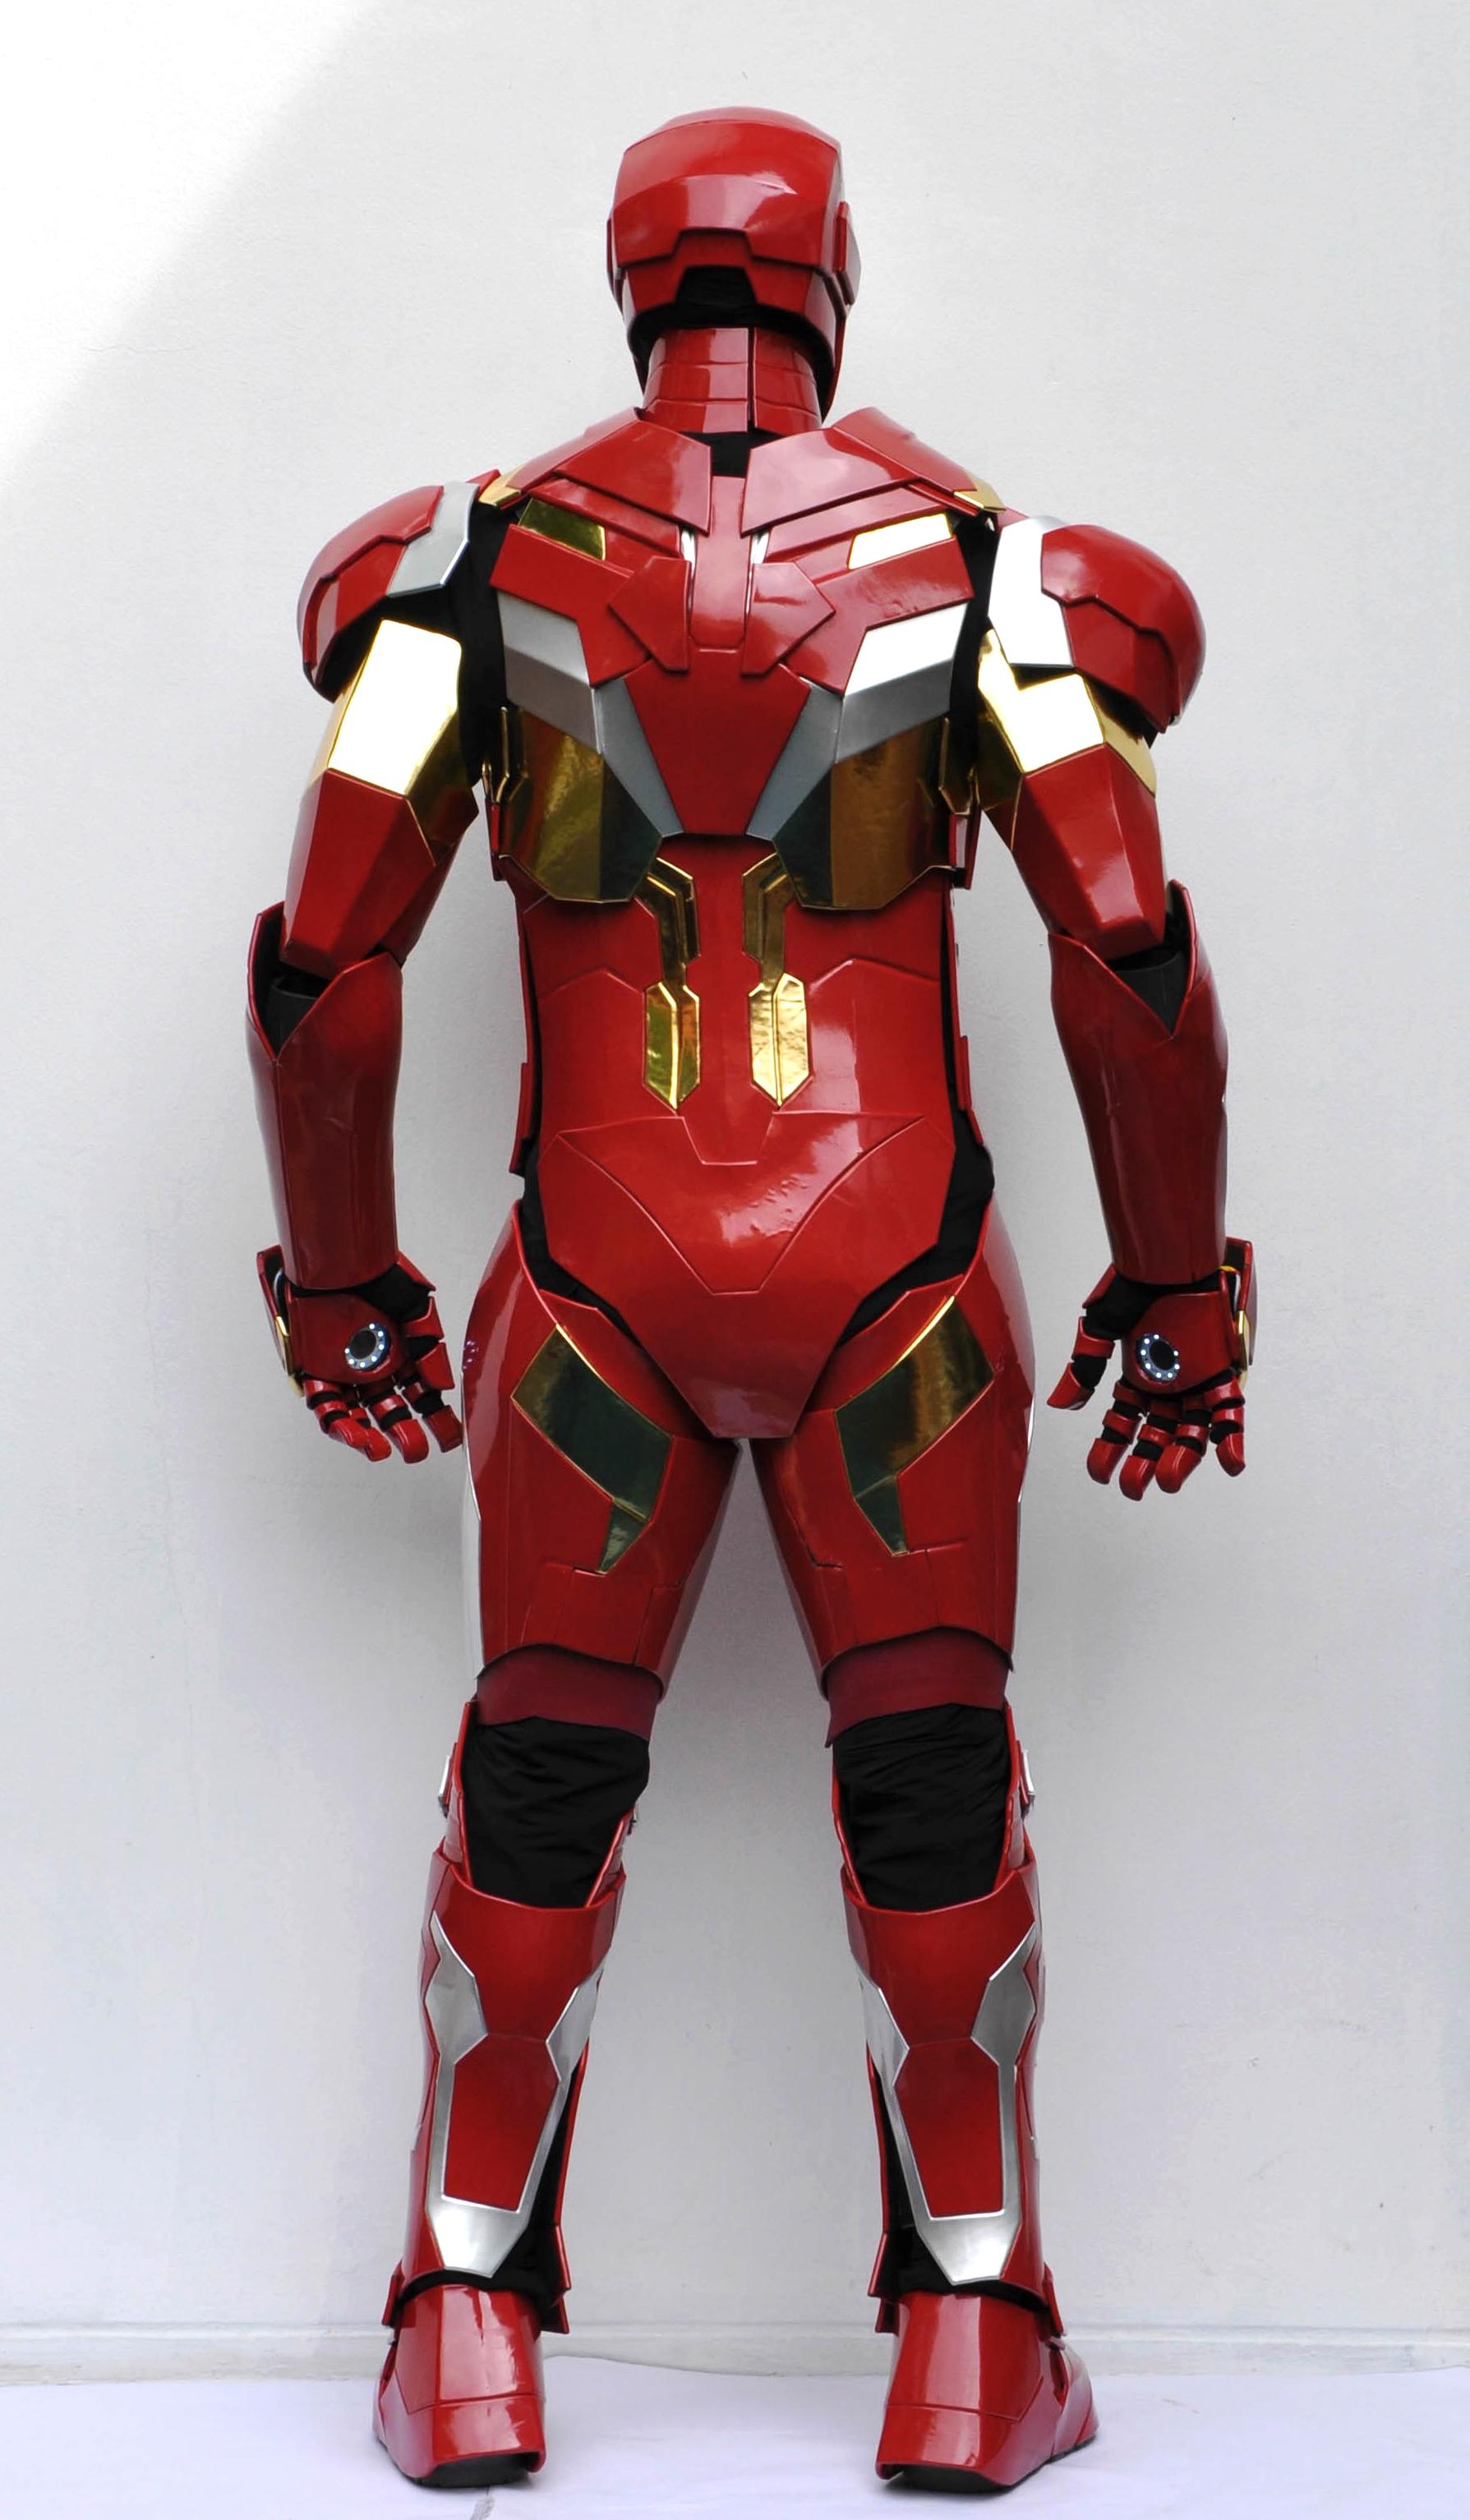 Ironman costume backside